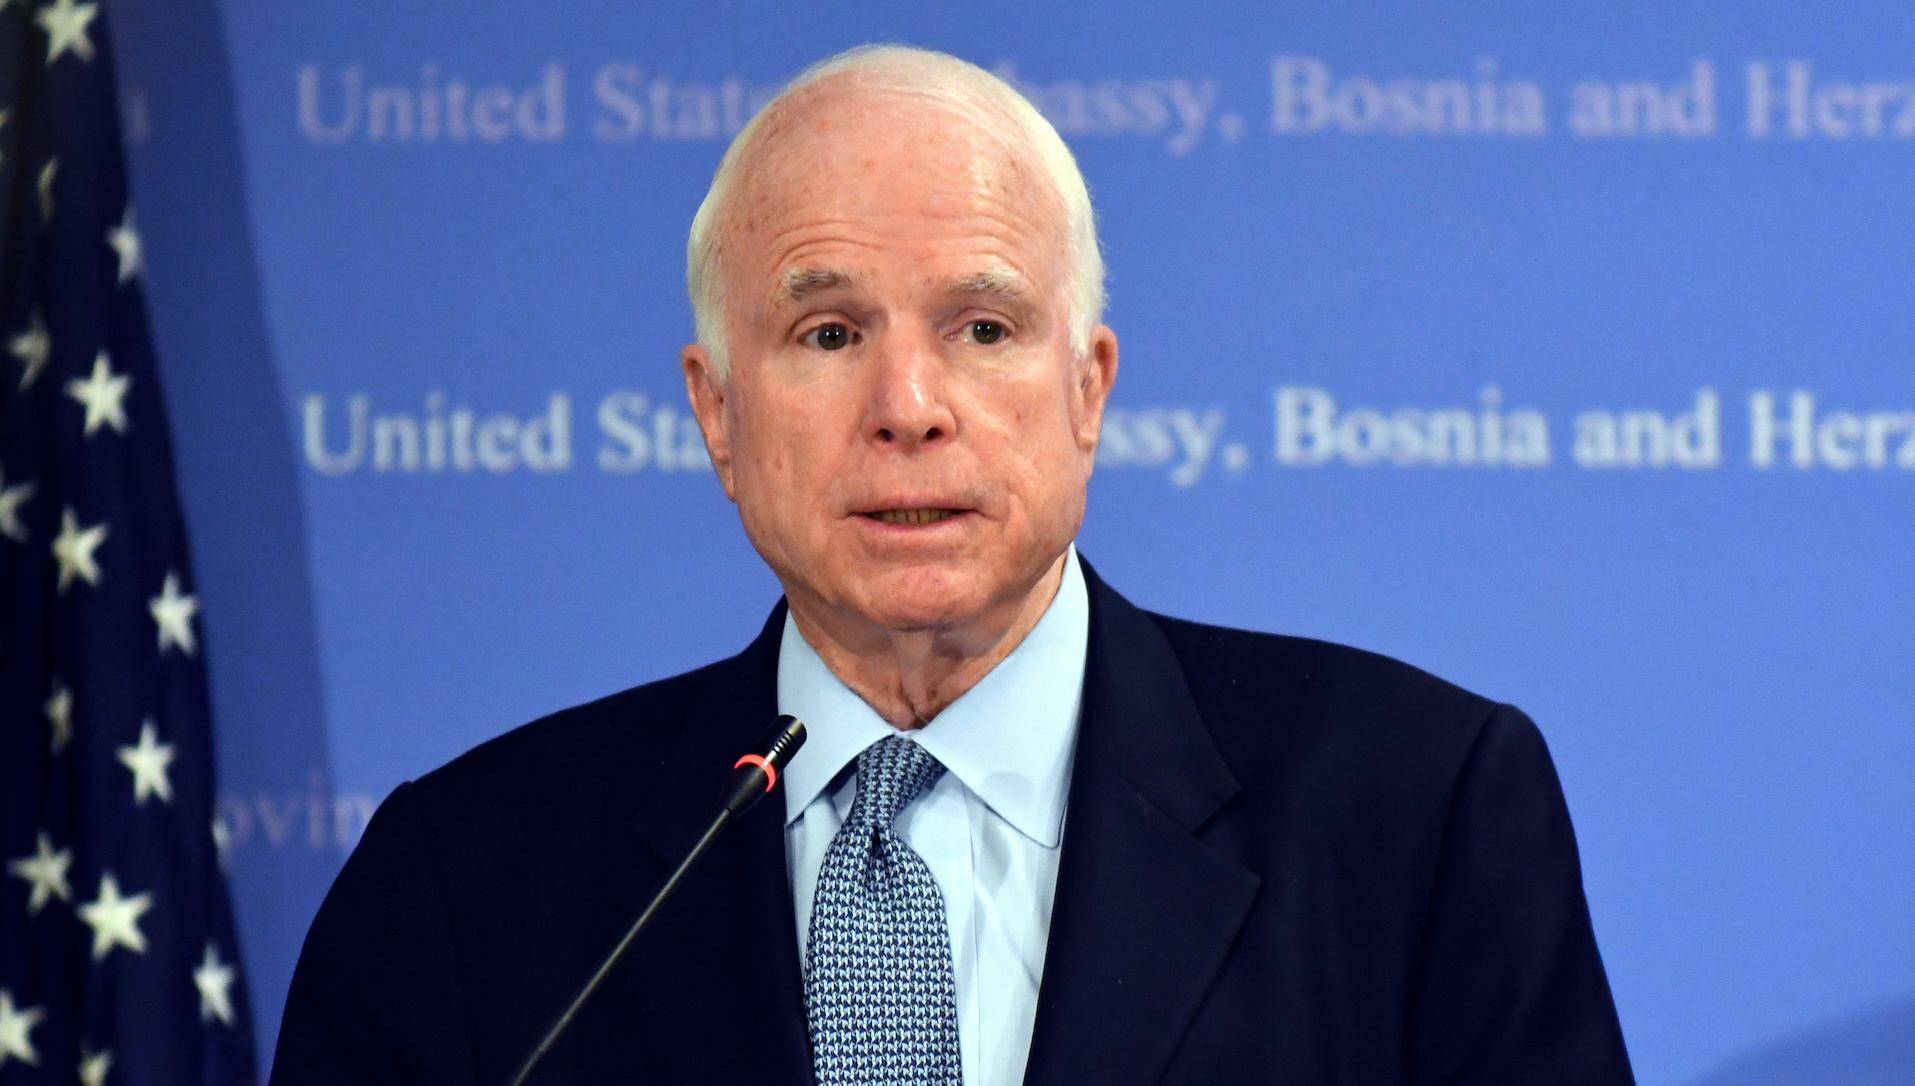 John McCain abandona tratamiento contra el cáncer